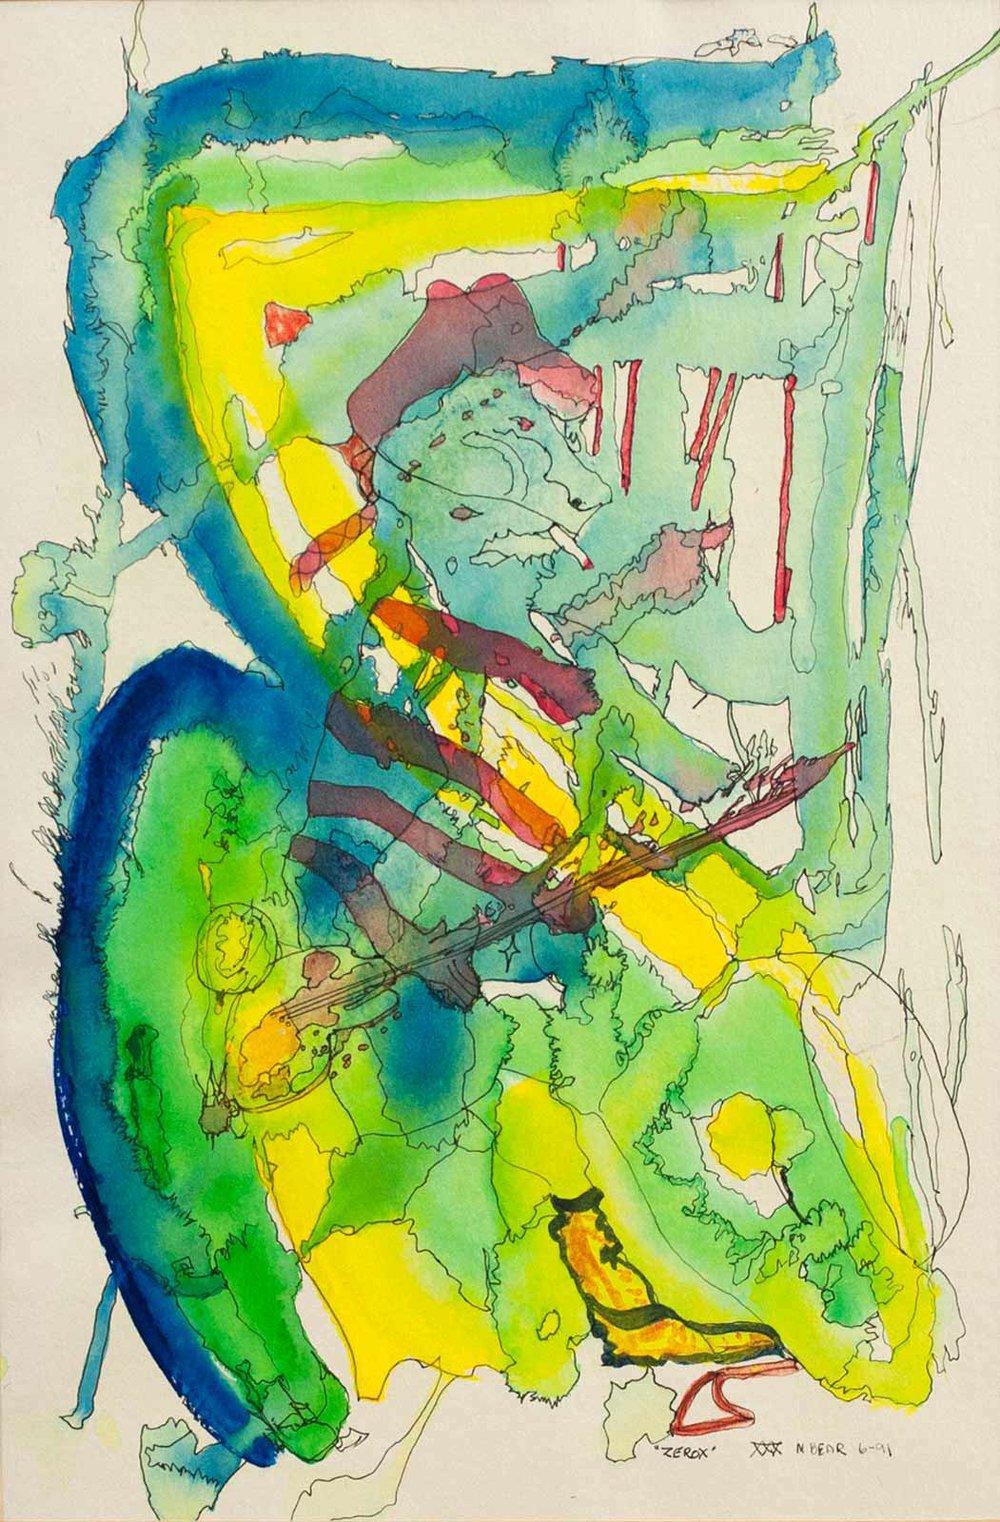 0520-MBS-06_1991-Zerox-watercolor_r8rdni.jpg